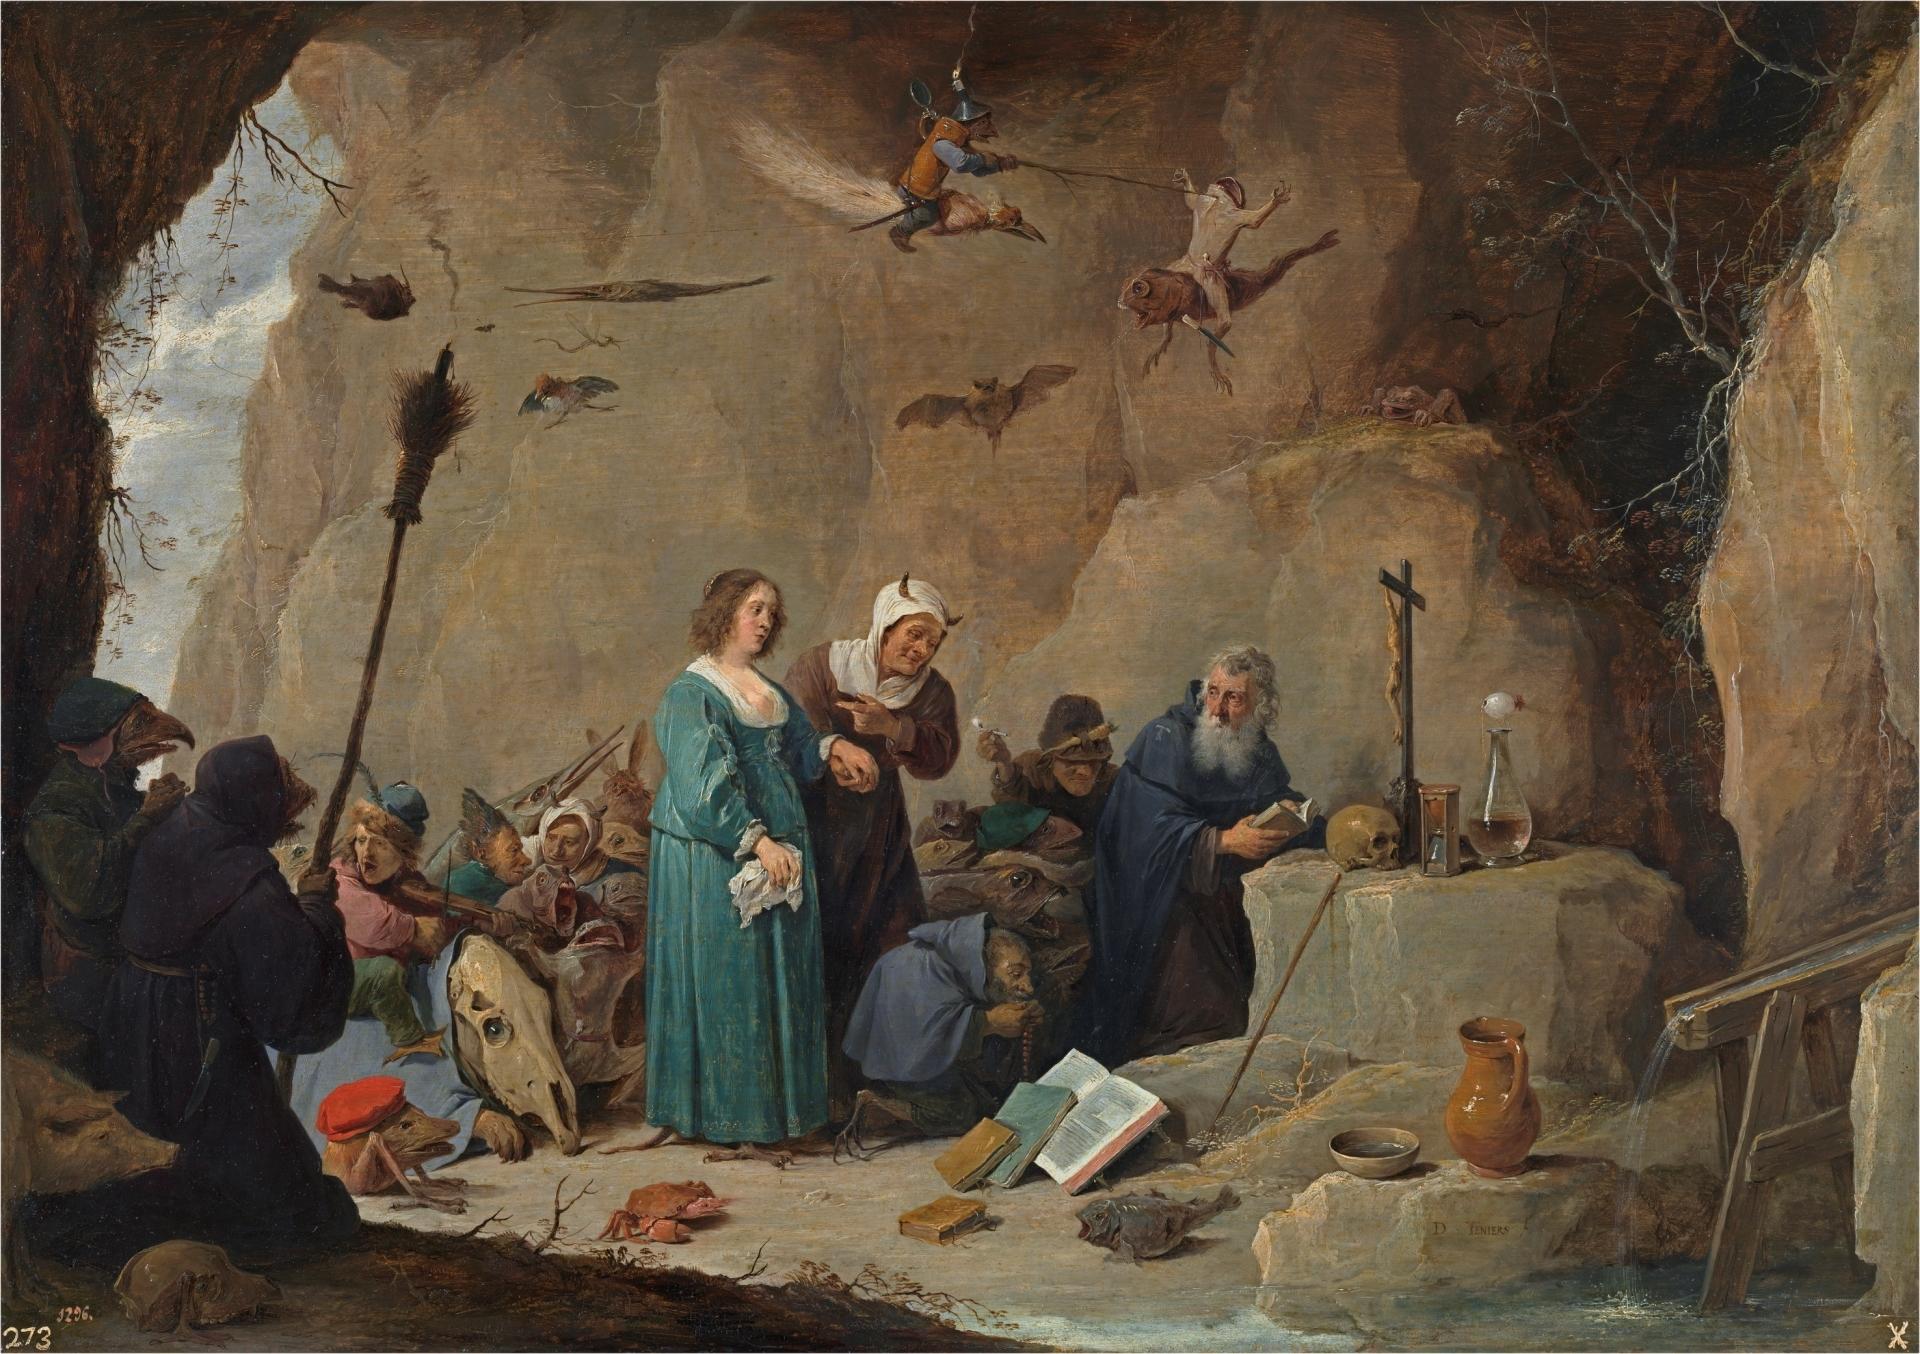 Картинки по запросу tentaciones de san antonio david teniers